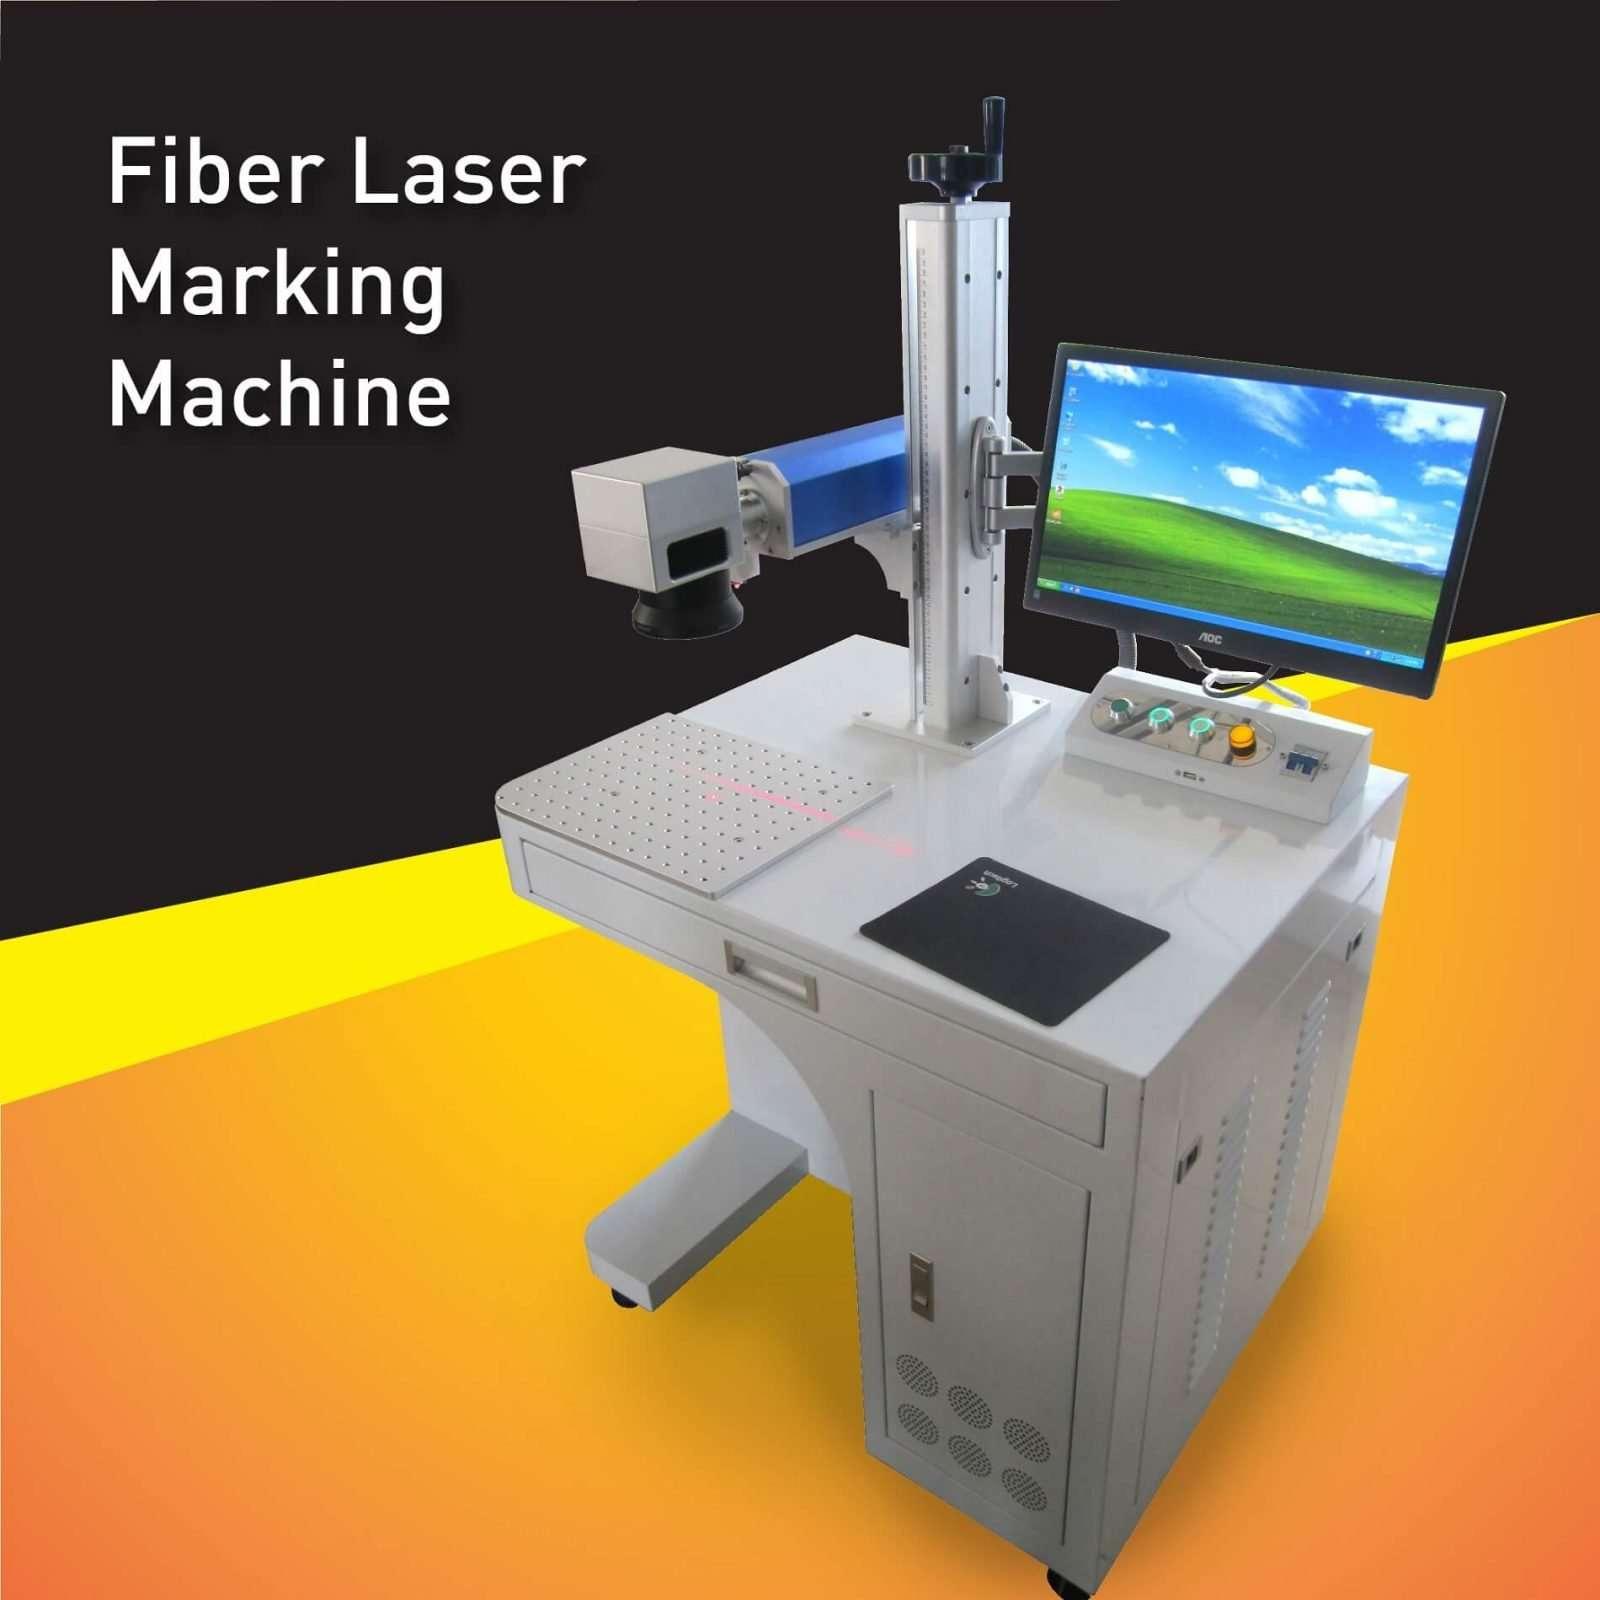 Fiber Laser marking Machines | HeatSign marking systems - Industrial marking systems